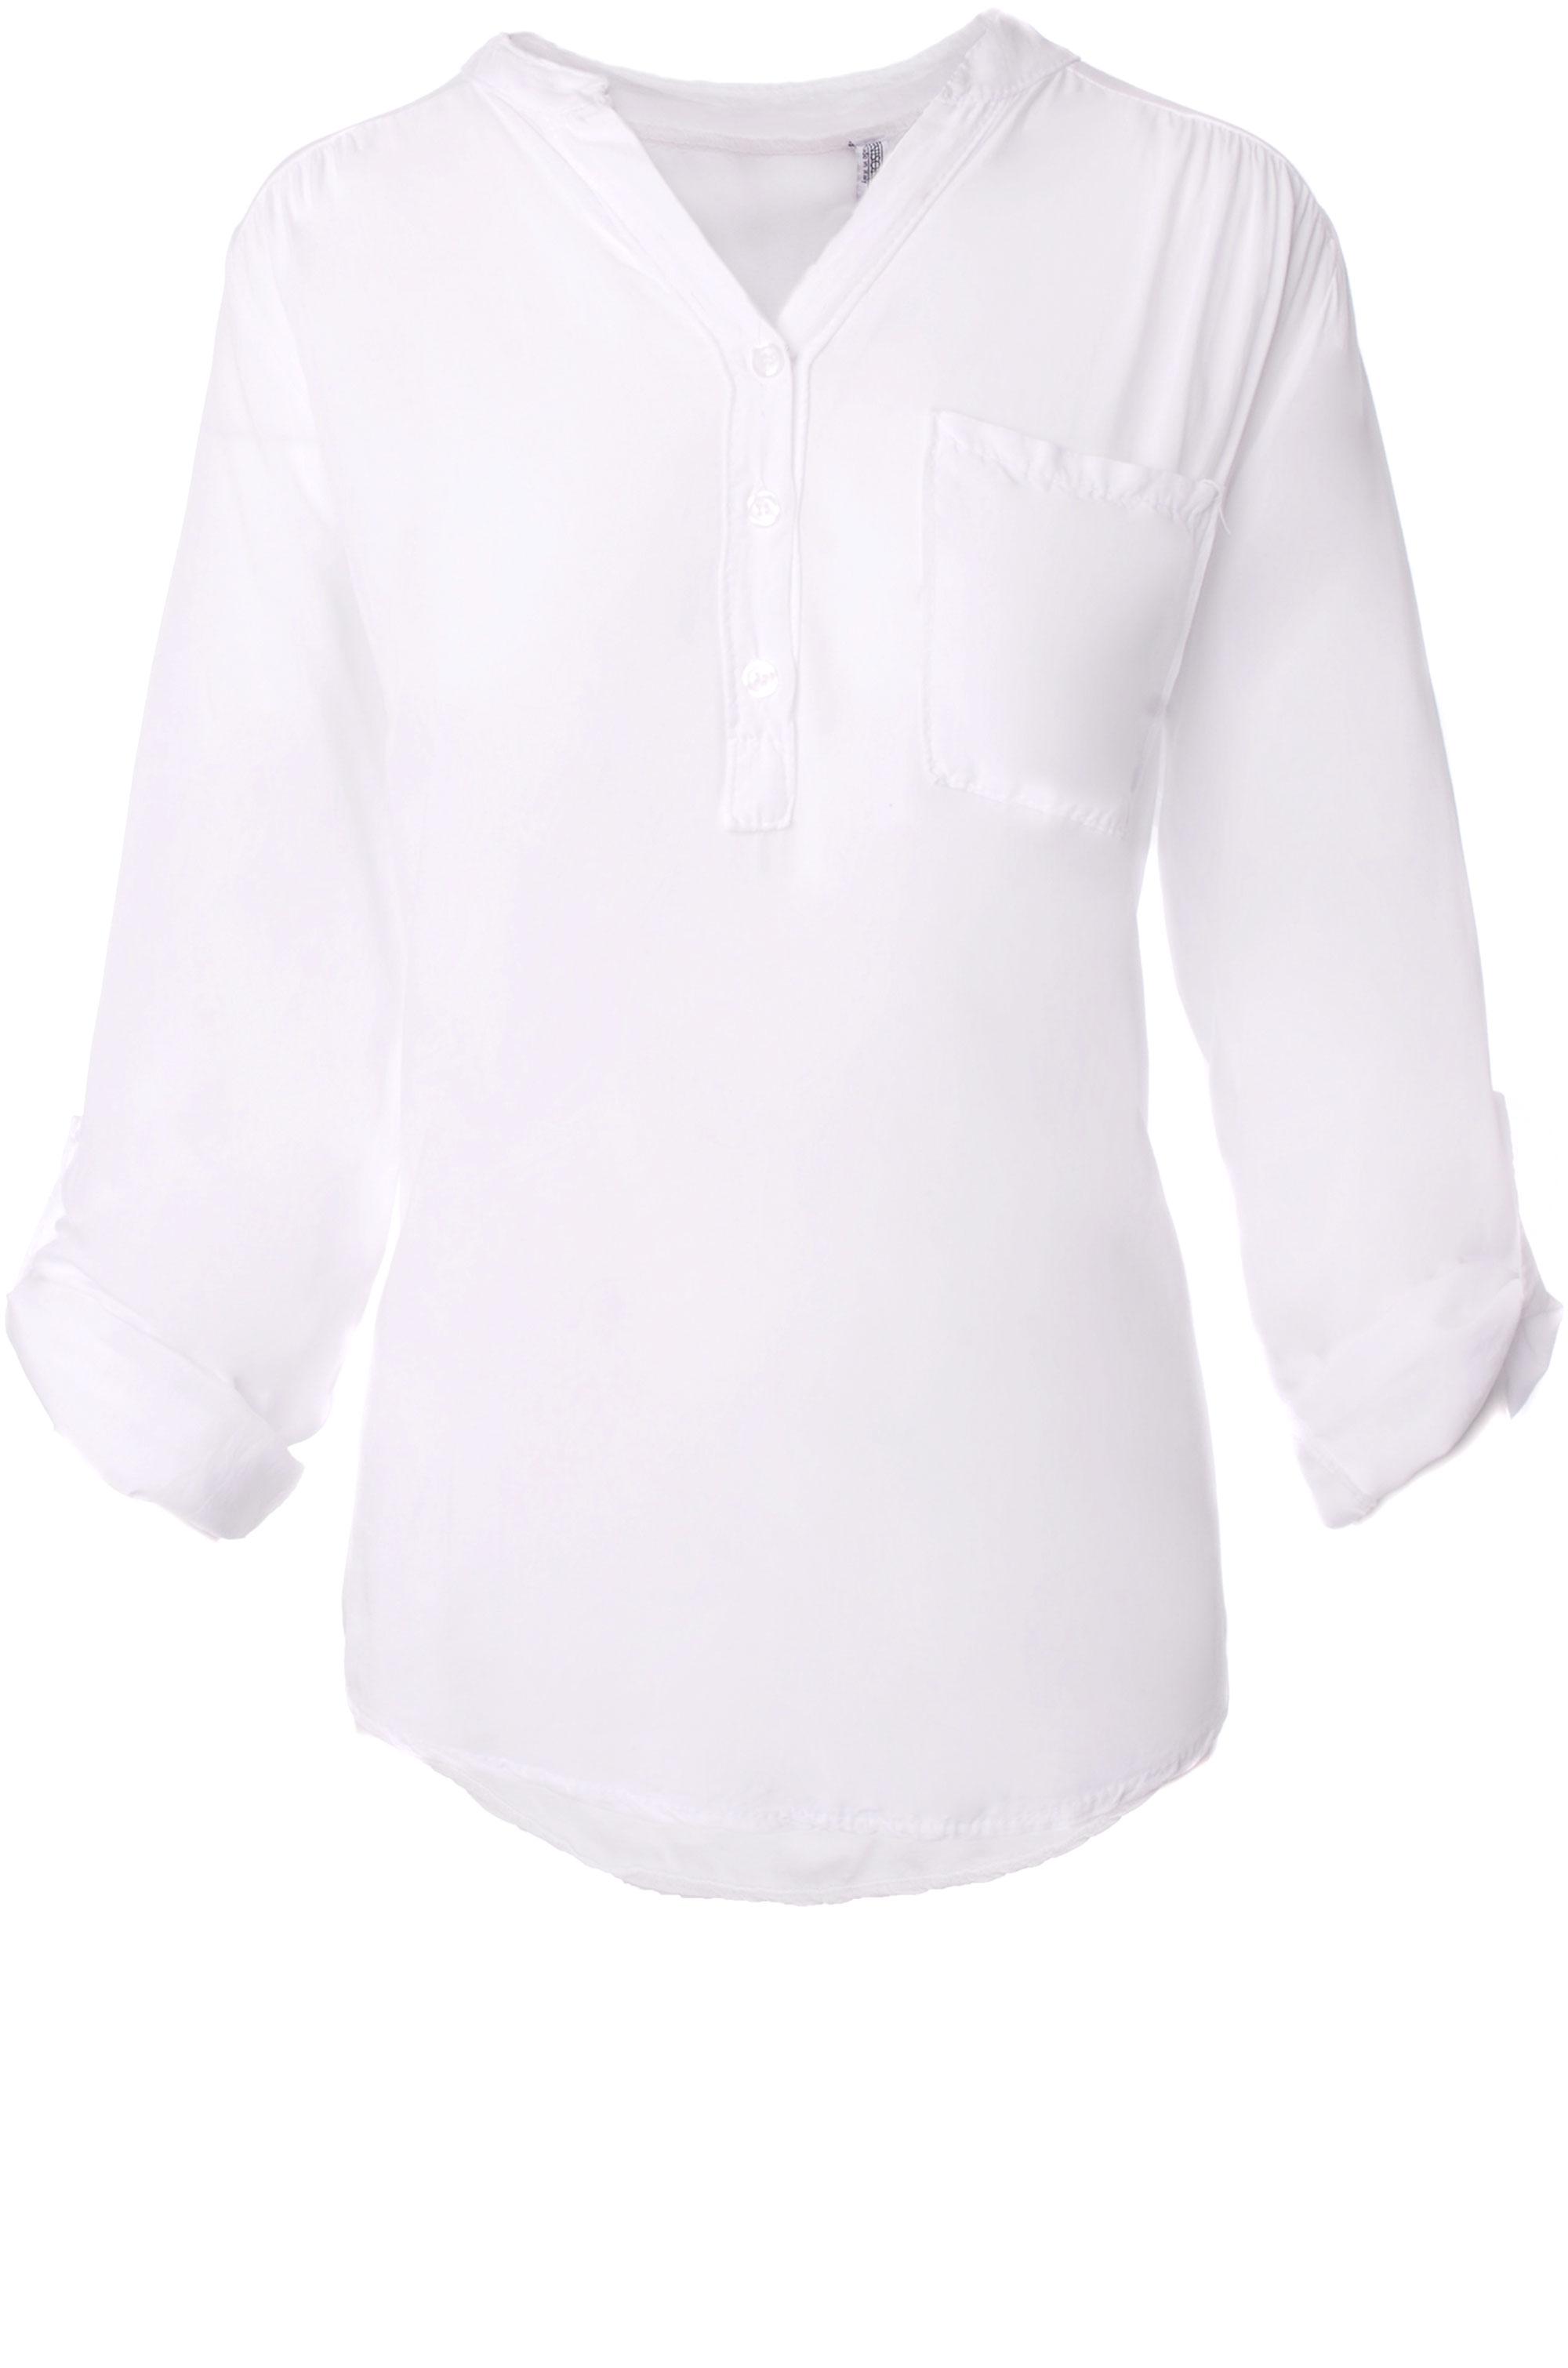 Koszula - 45-507 BIANCO - Unisono